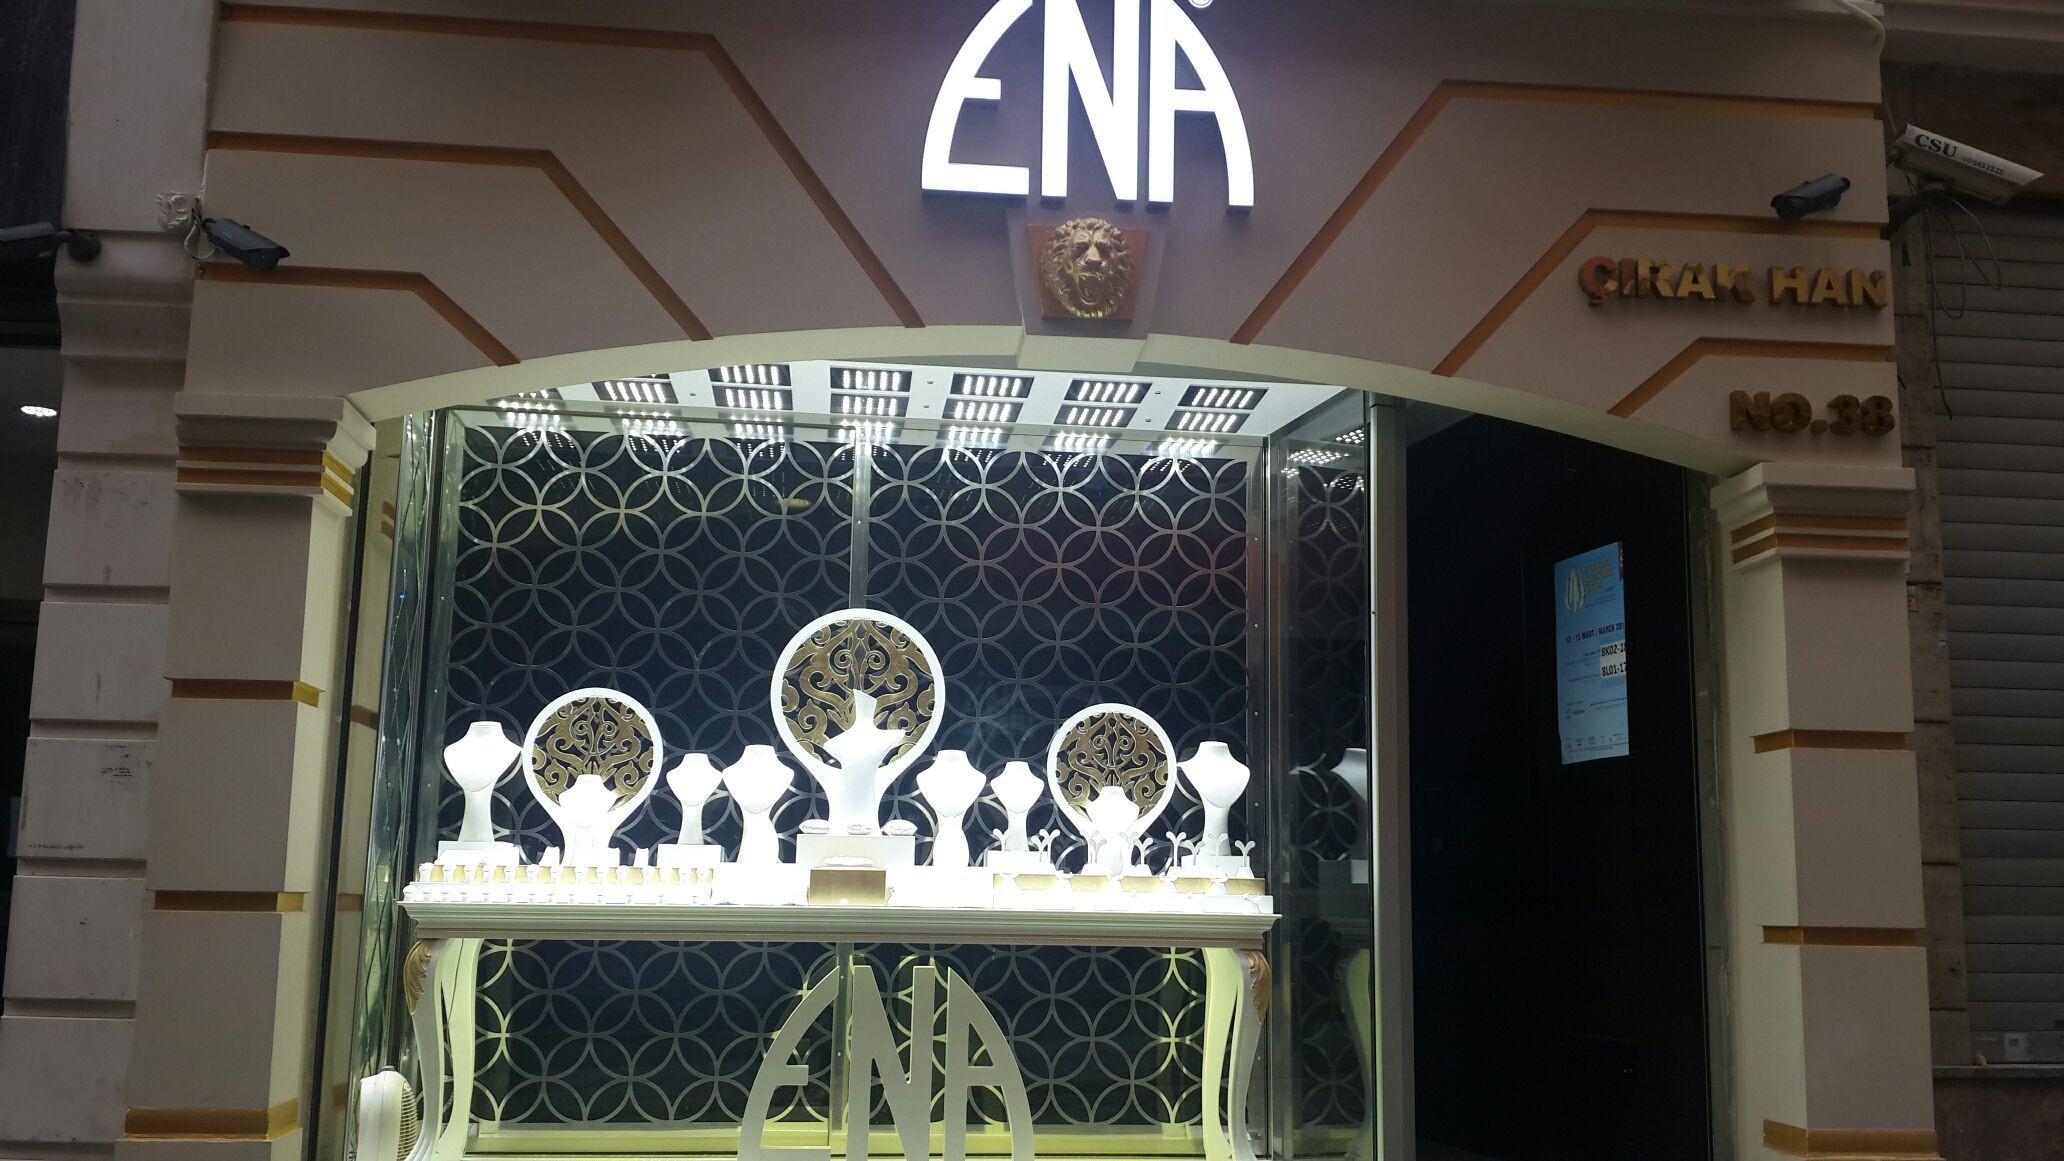 #jewellery#silver#watch#accessories#lighting#markaled#luxury#istanbul#jewelry#store# MARKALED AYDINLATMA VİTRİN AYDINLATMALARINDA ÇÖZÜM ORTAĞINIZ Showcase lighting solution partner markaledaydinlatma@gmail.com ramazan@markaled.com